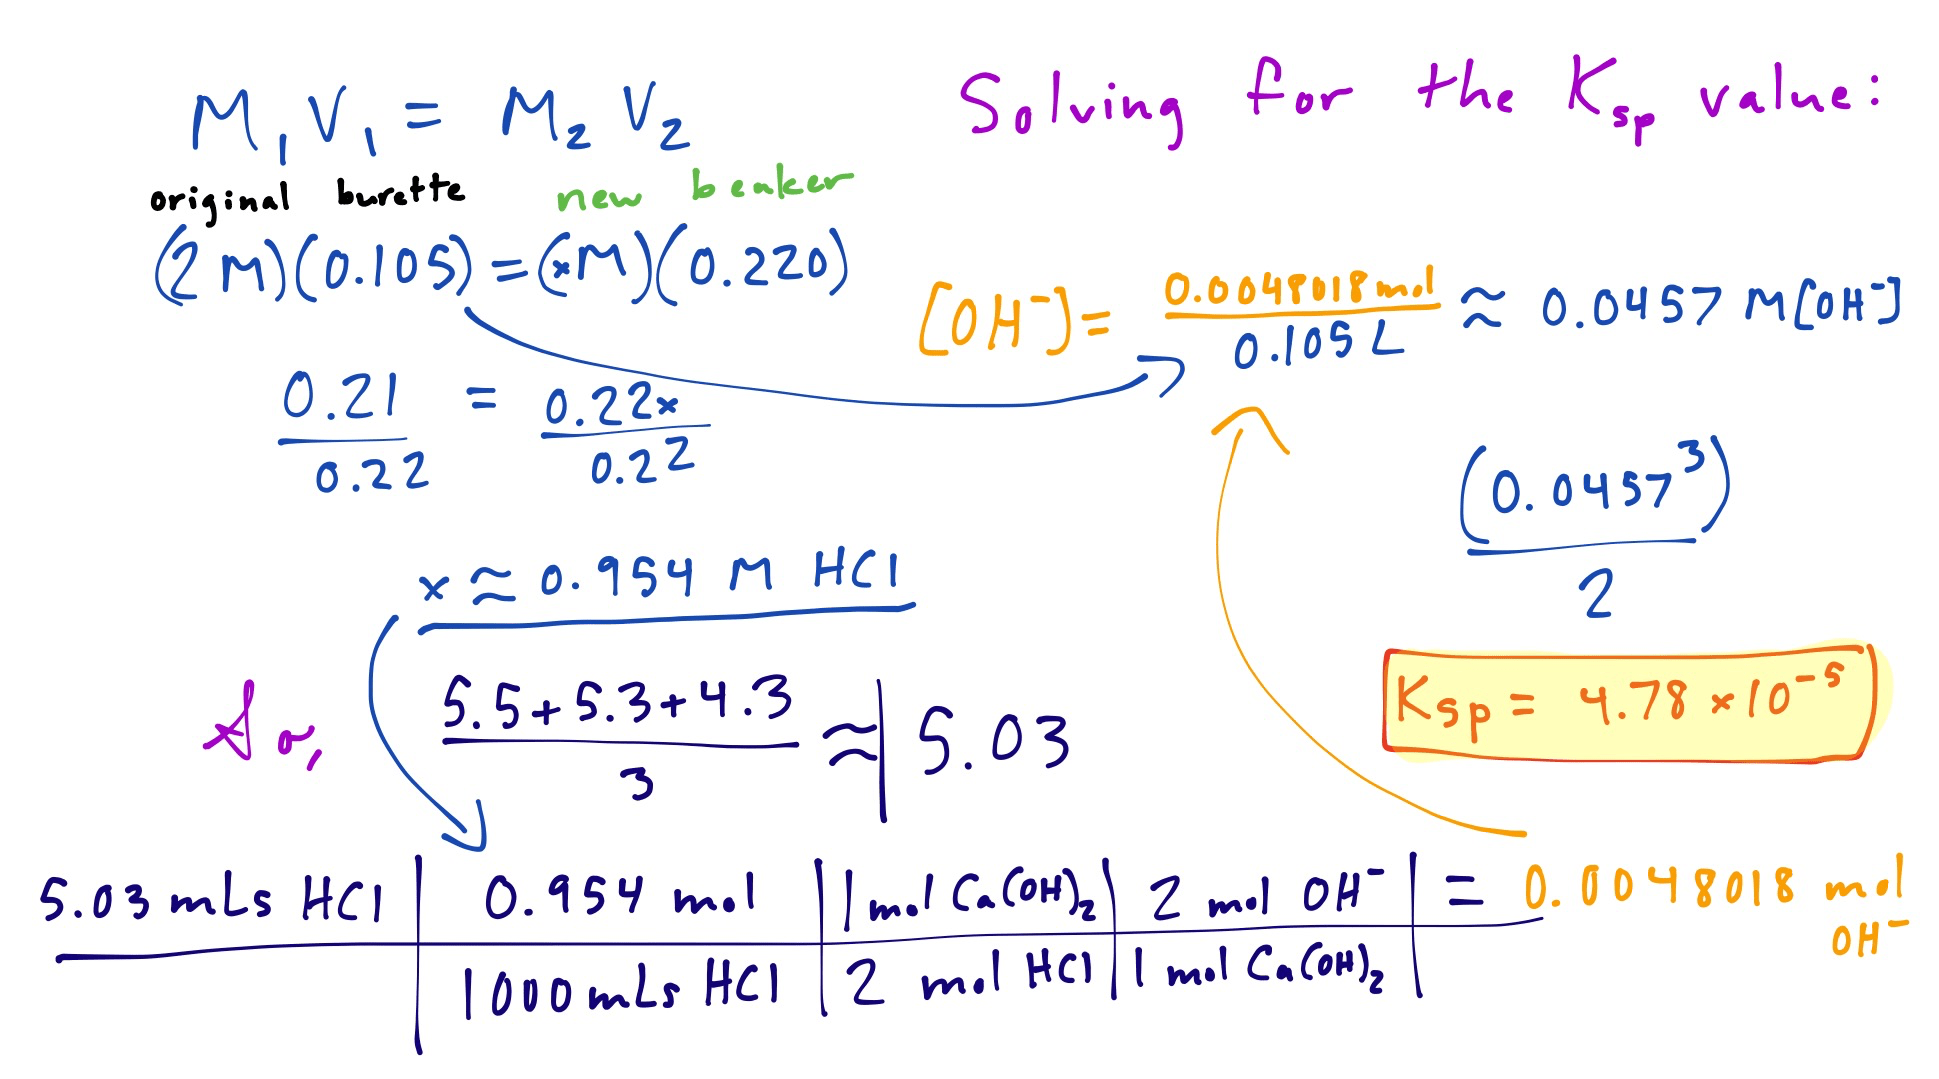 Lab Vii Ksp Amp Solubility Product Calcium Hydroxide Ca